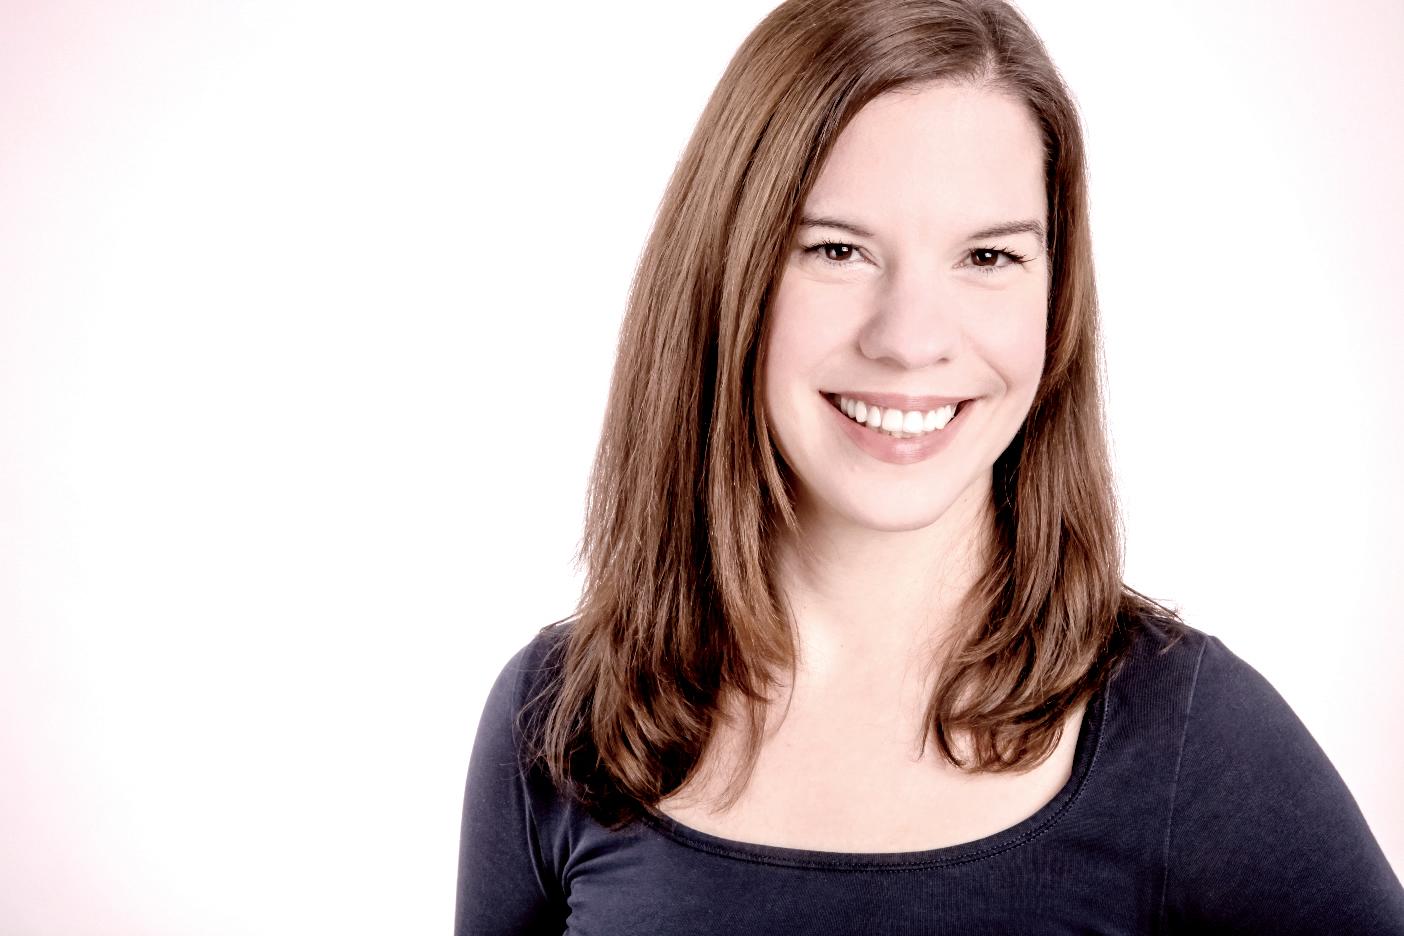 Anna Hofer